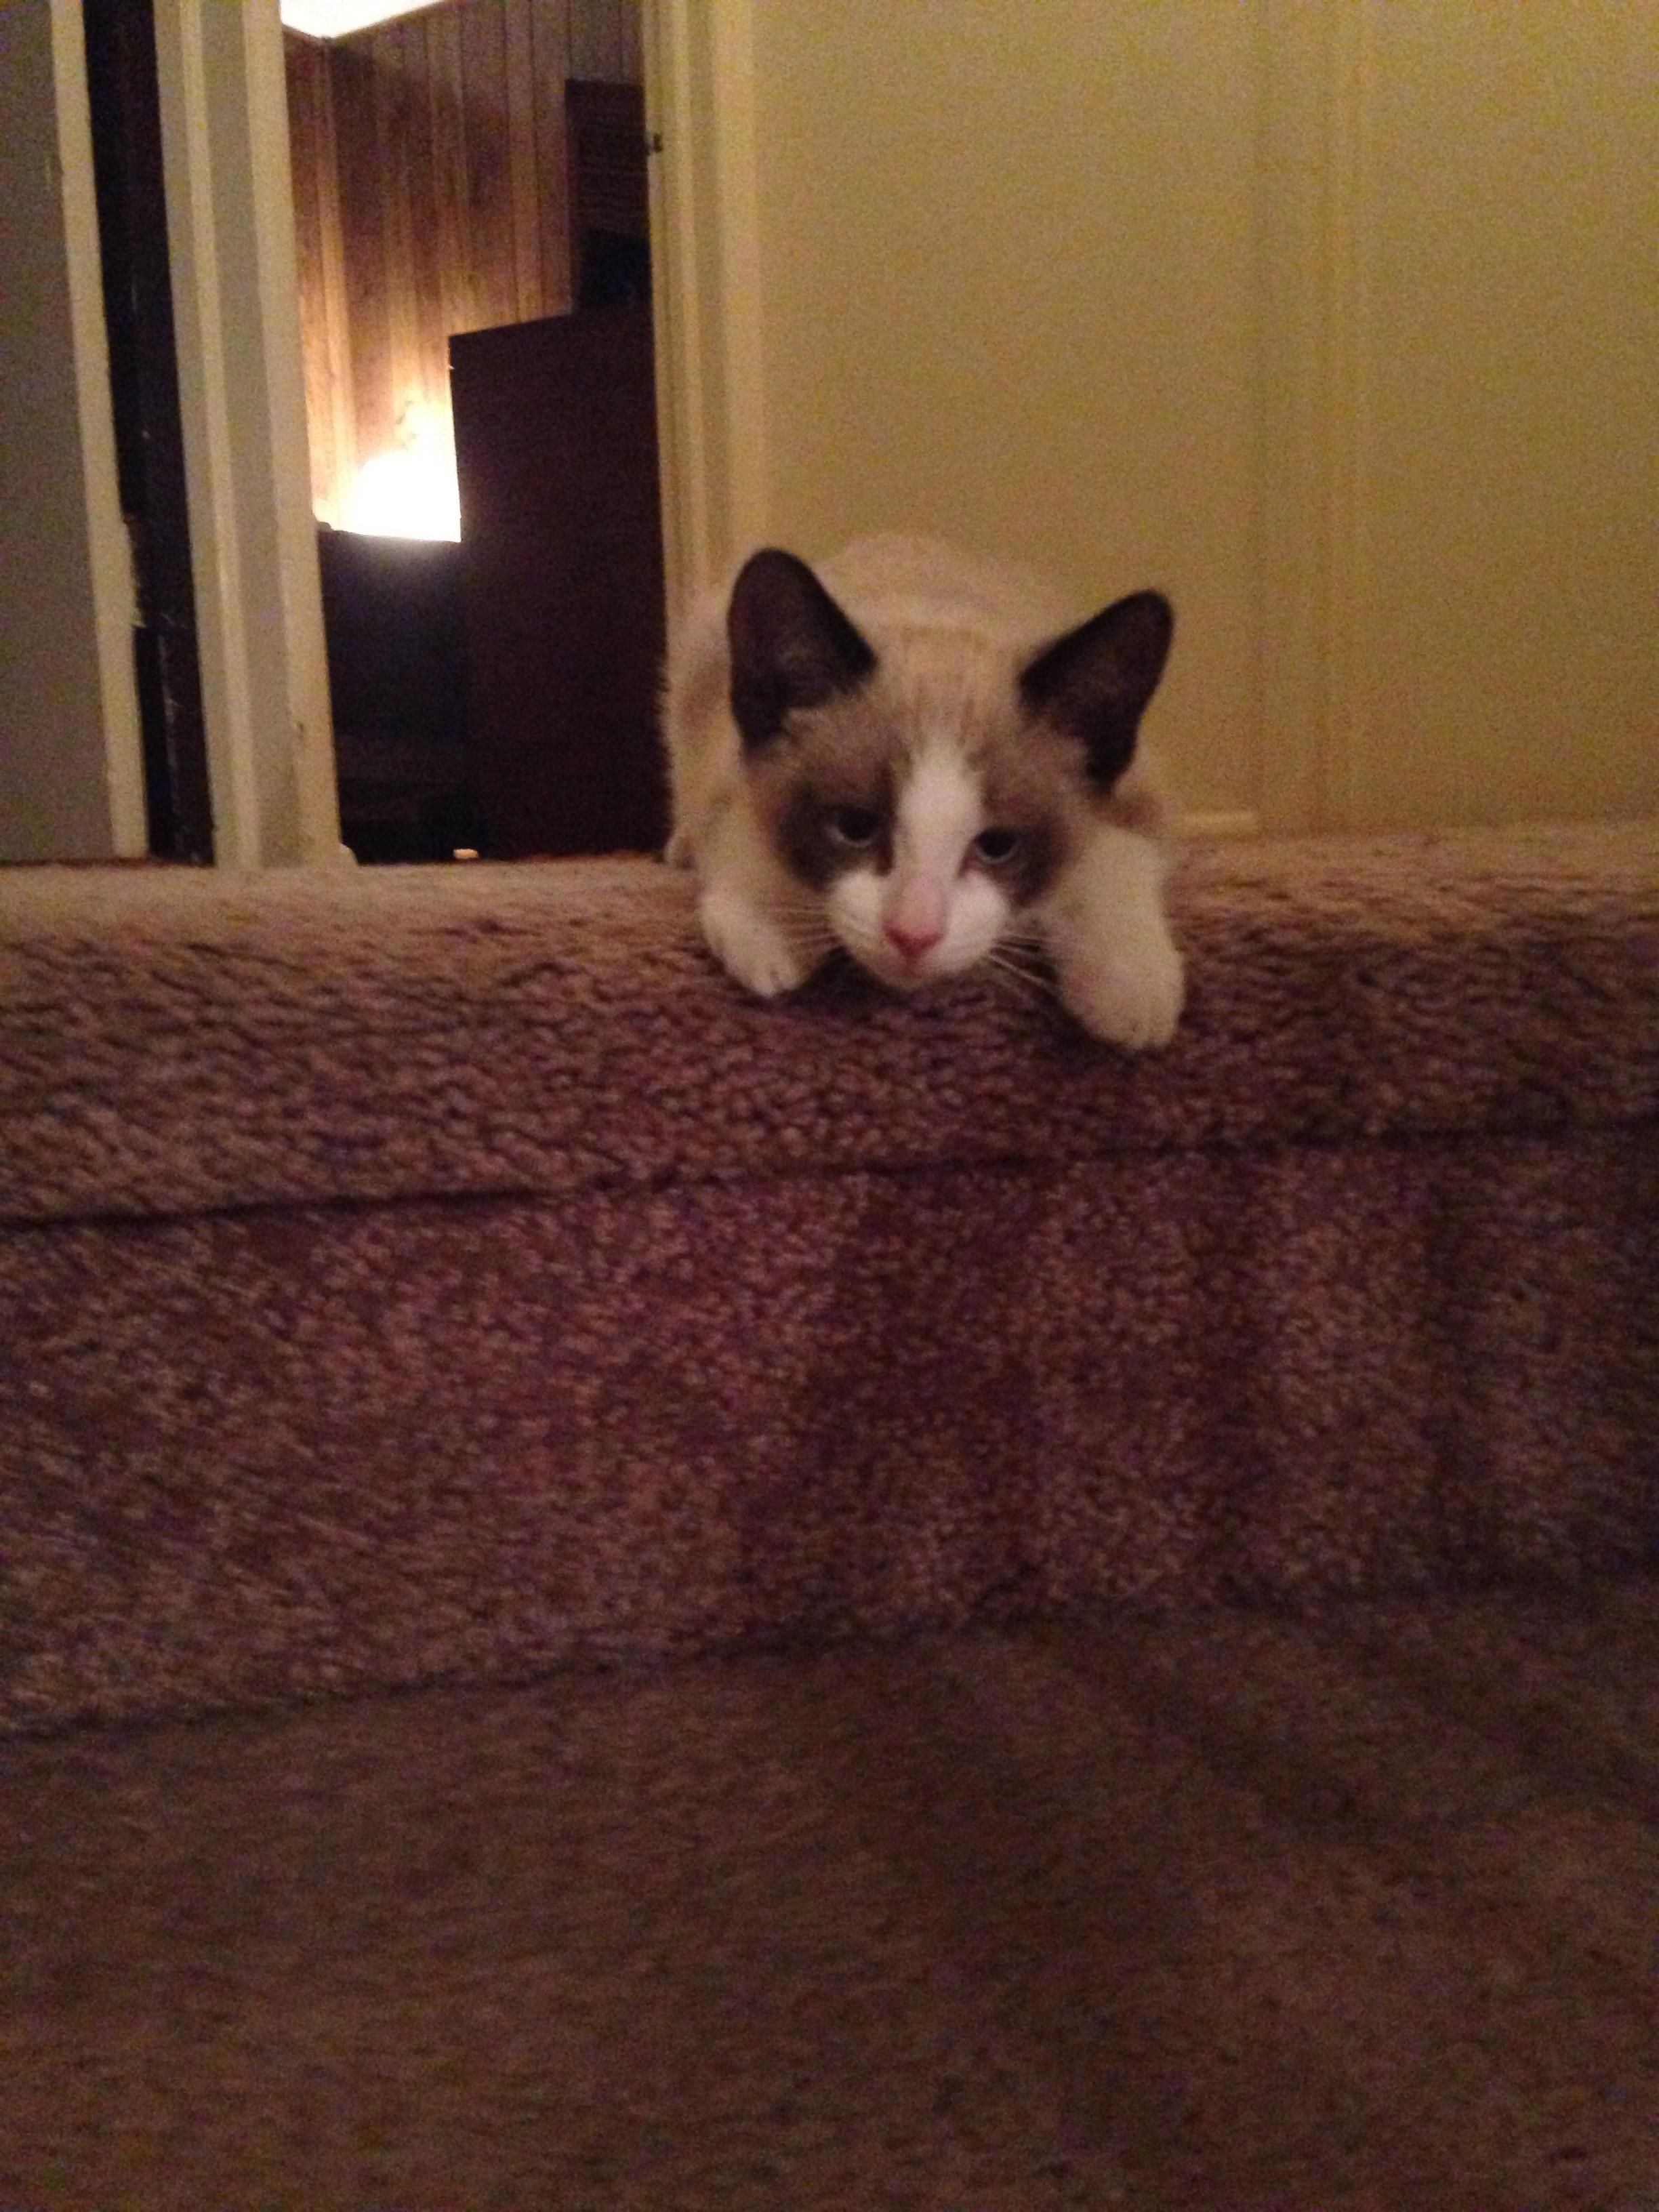 Newest Member To The Family Siamese Kittens Kitten Cat Lovers